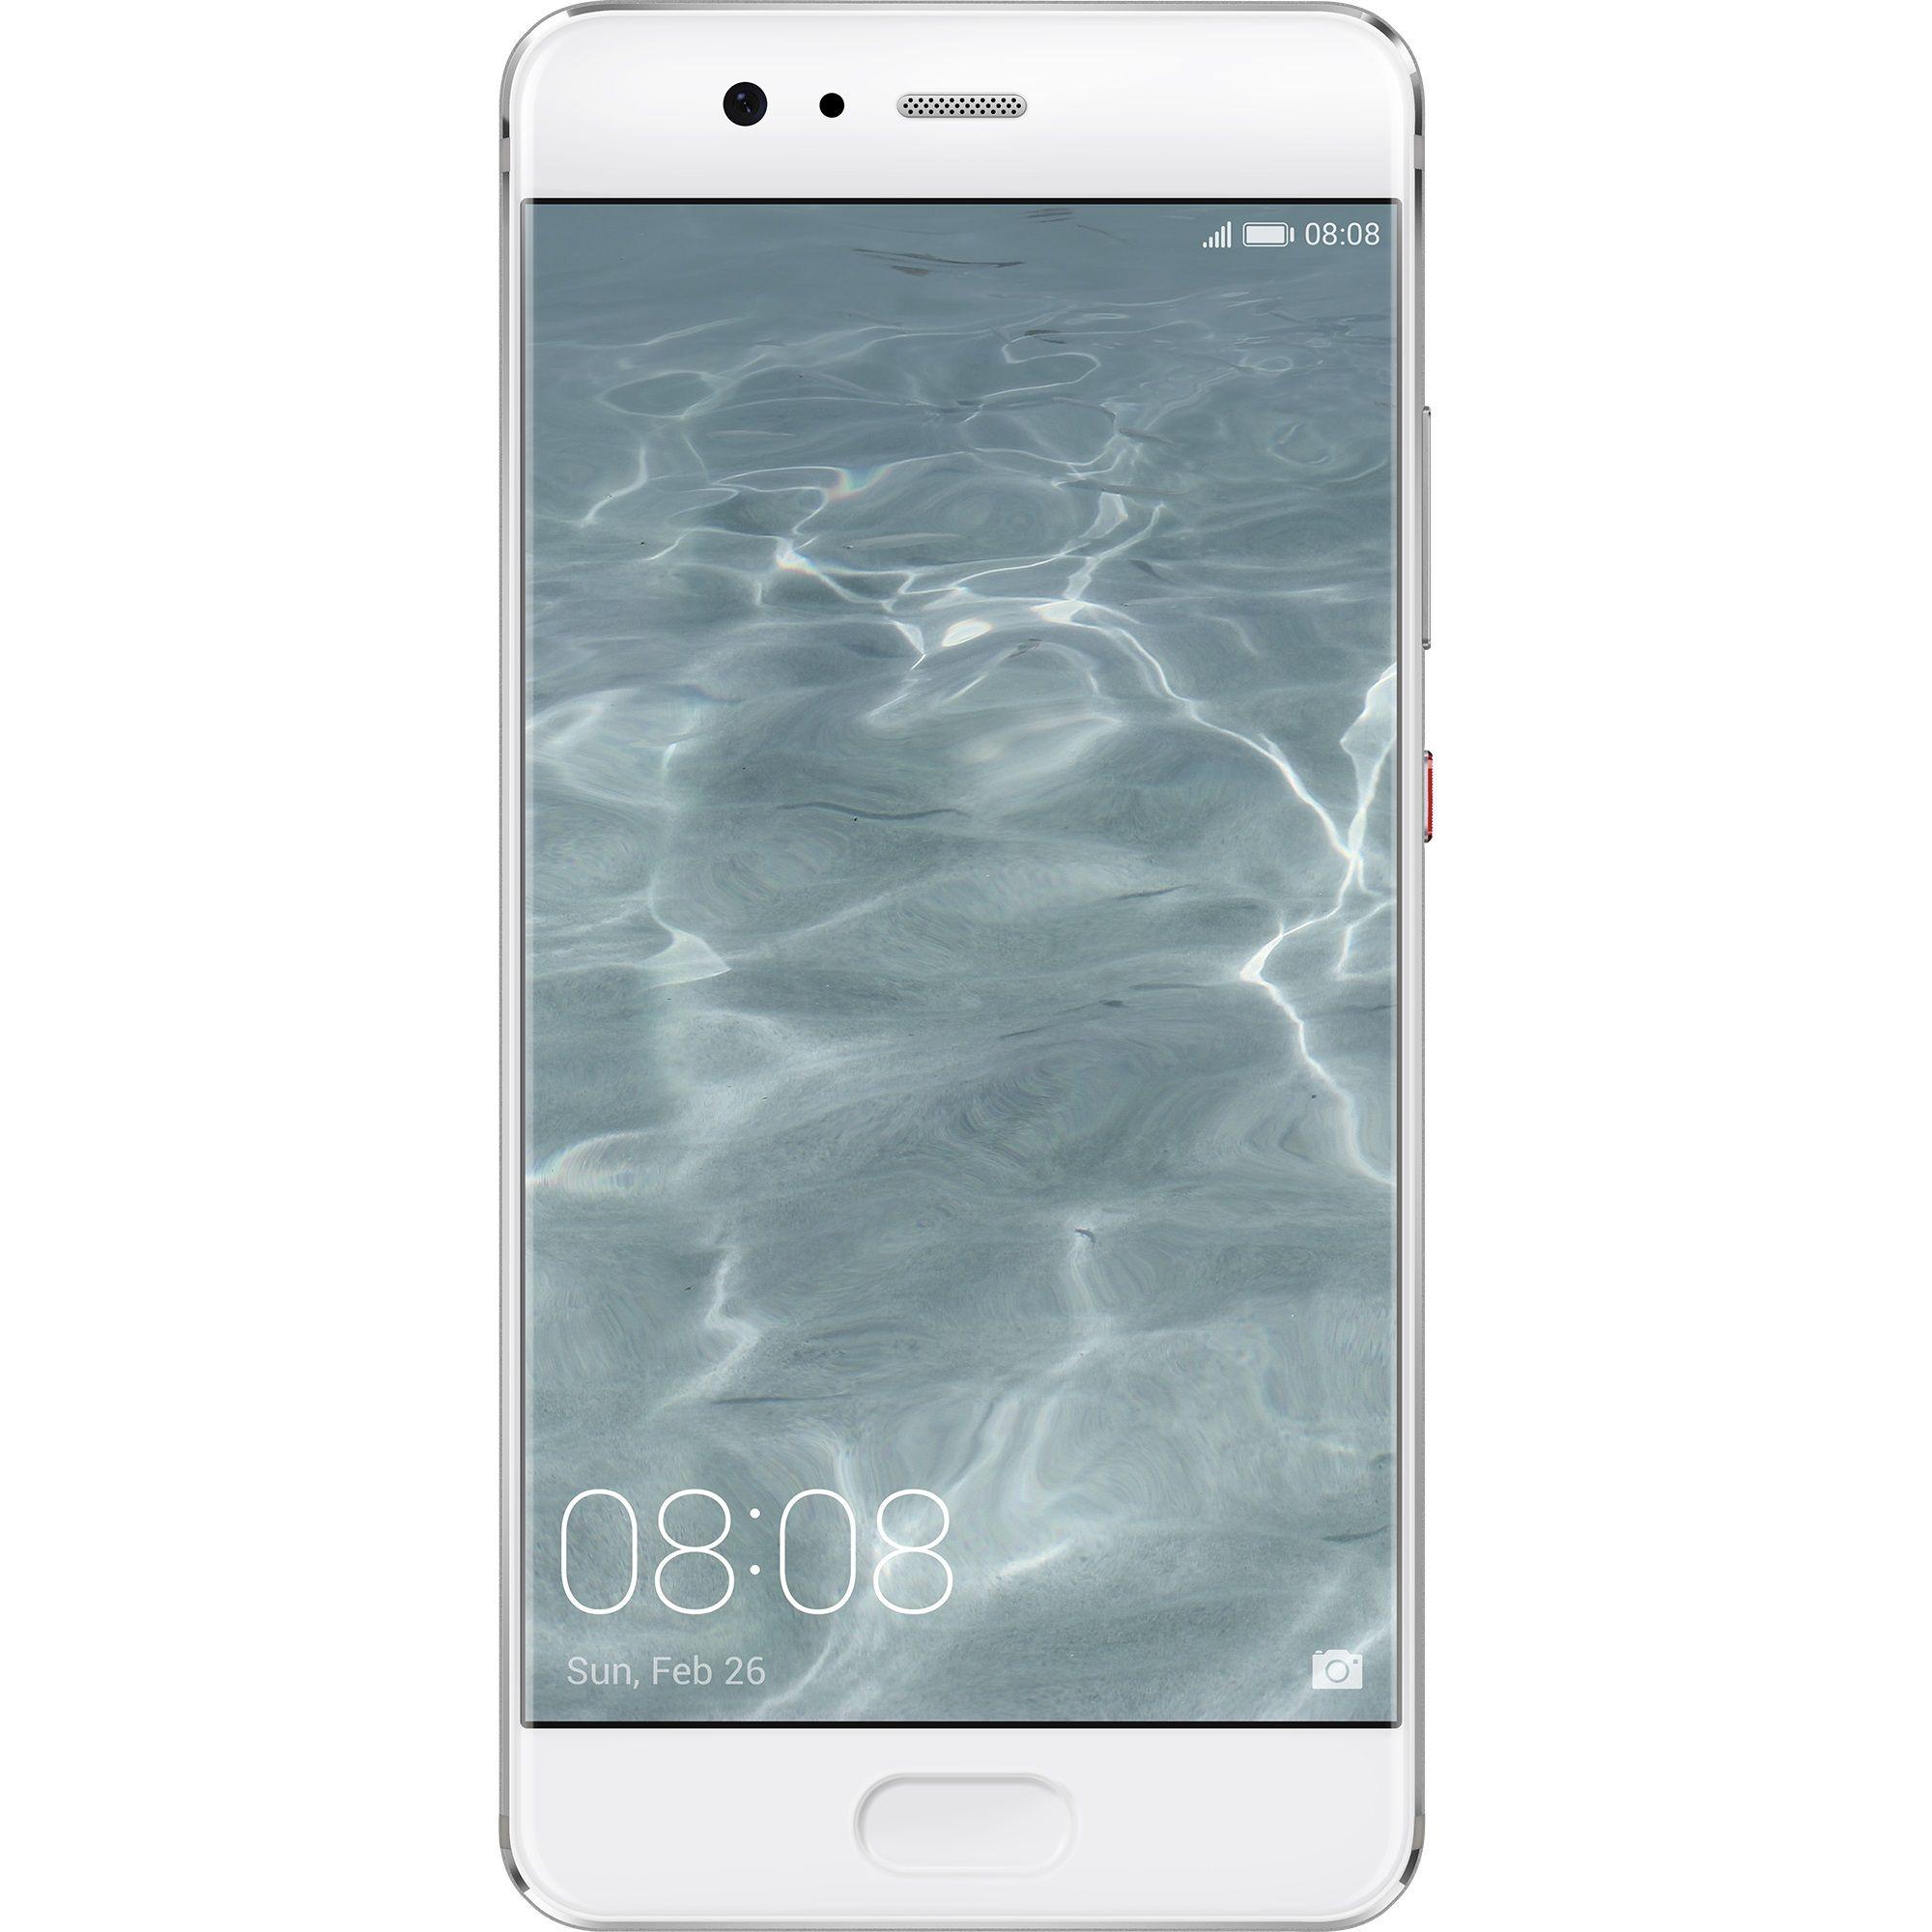 Telefon Mobil Huawei P10 Plus 128GB Flash 6GB RAM Dual SIM 4G Mystic Silver title=Telefon Mobil Huawei P10 Plus 128GB Flash 6GB RAM Dual SIM 4G Mystic Silver